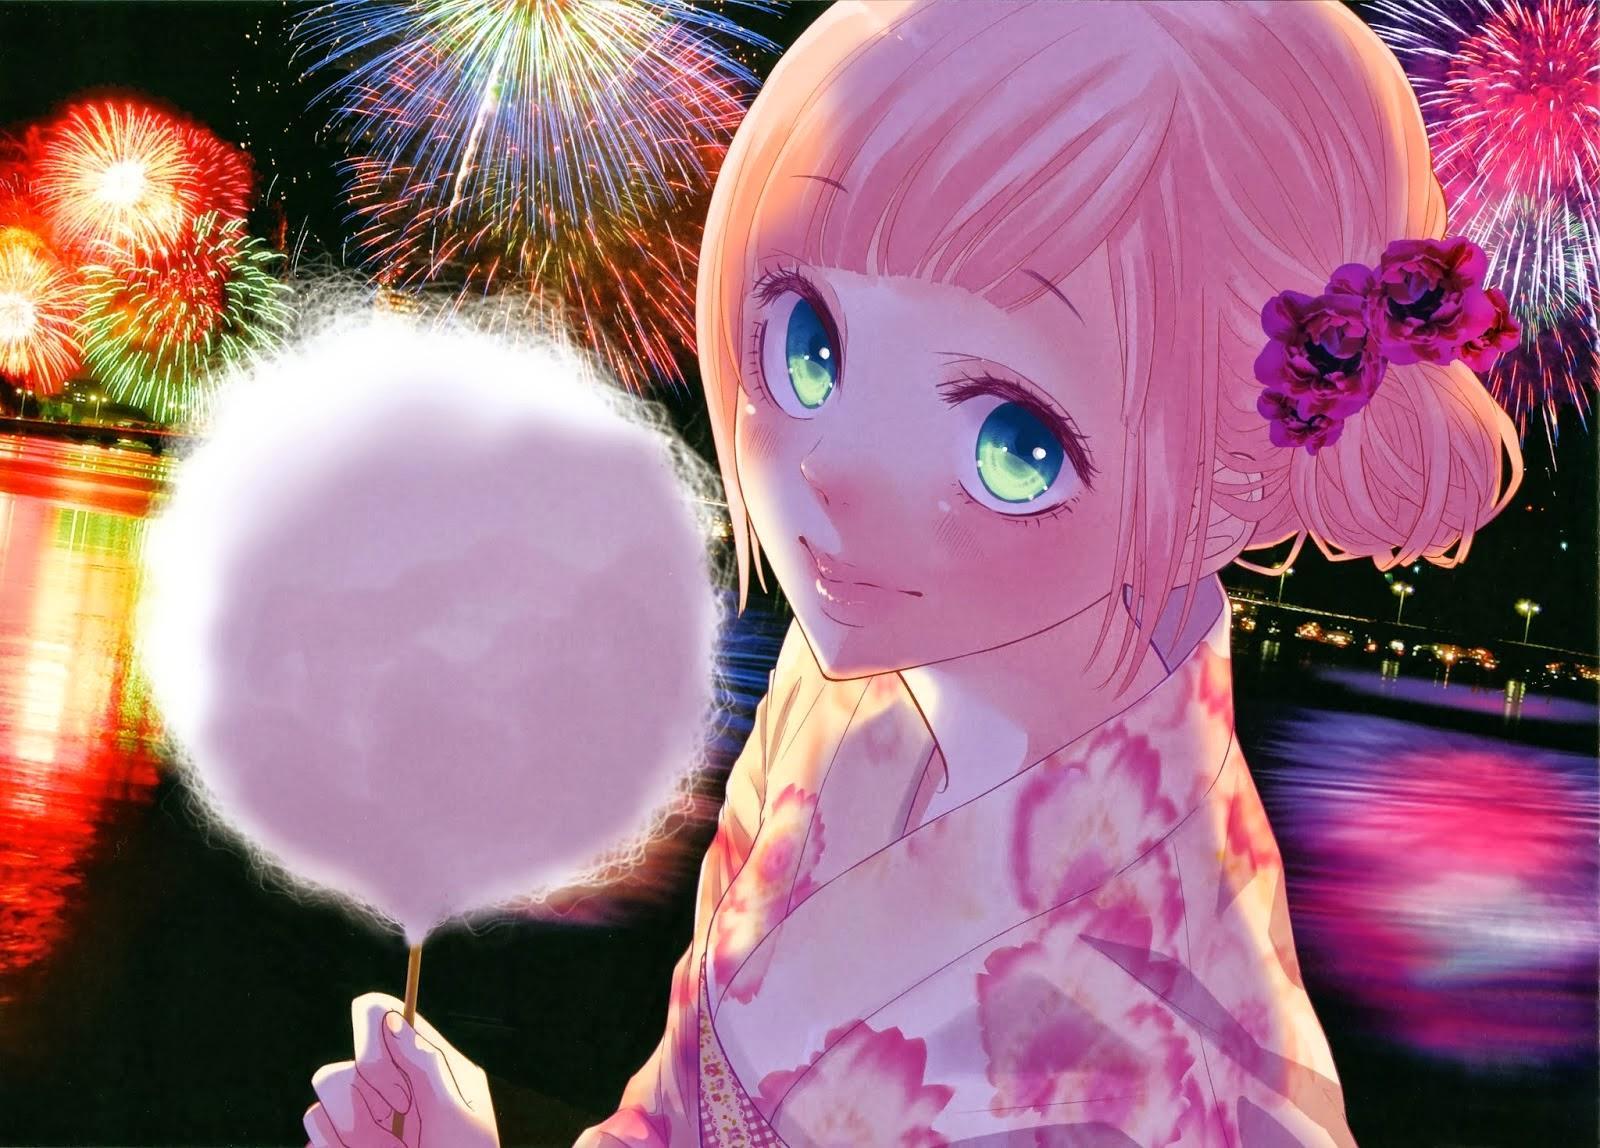 Gambar anime terbaru keren banget deloiz wallpaper - Foto anime keren hd ...